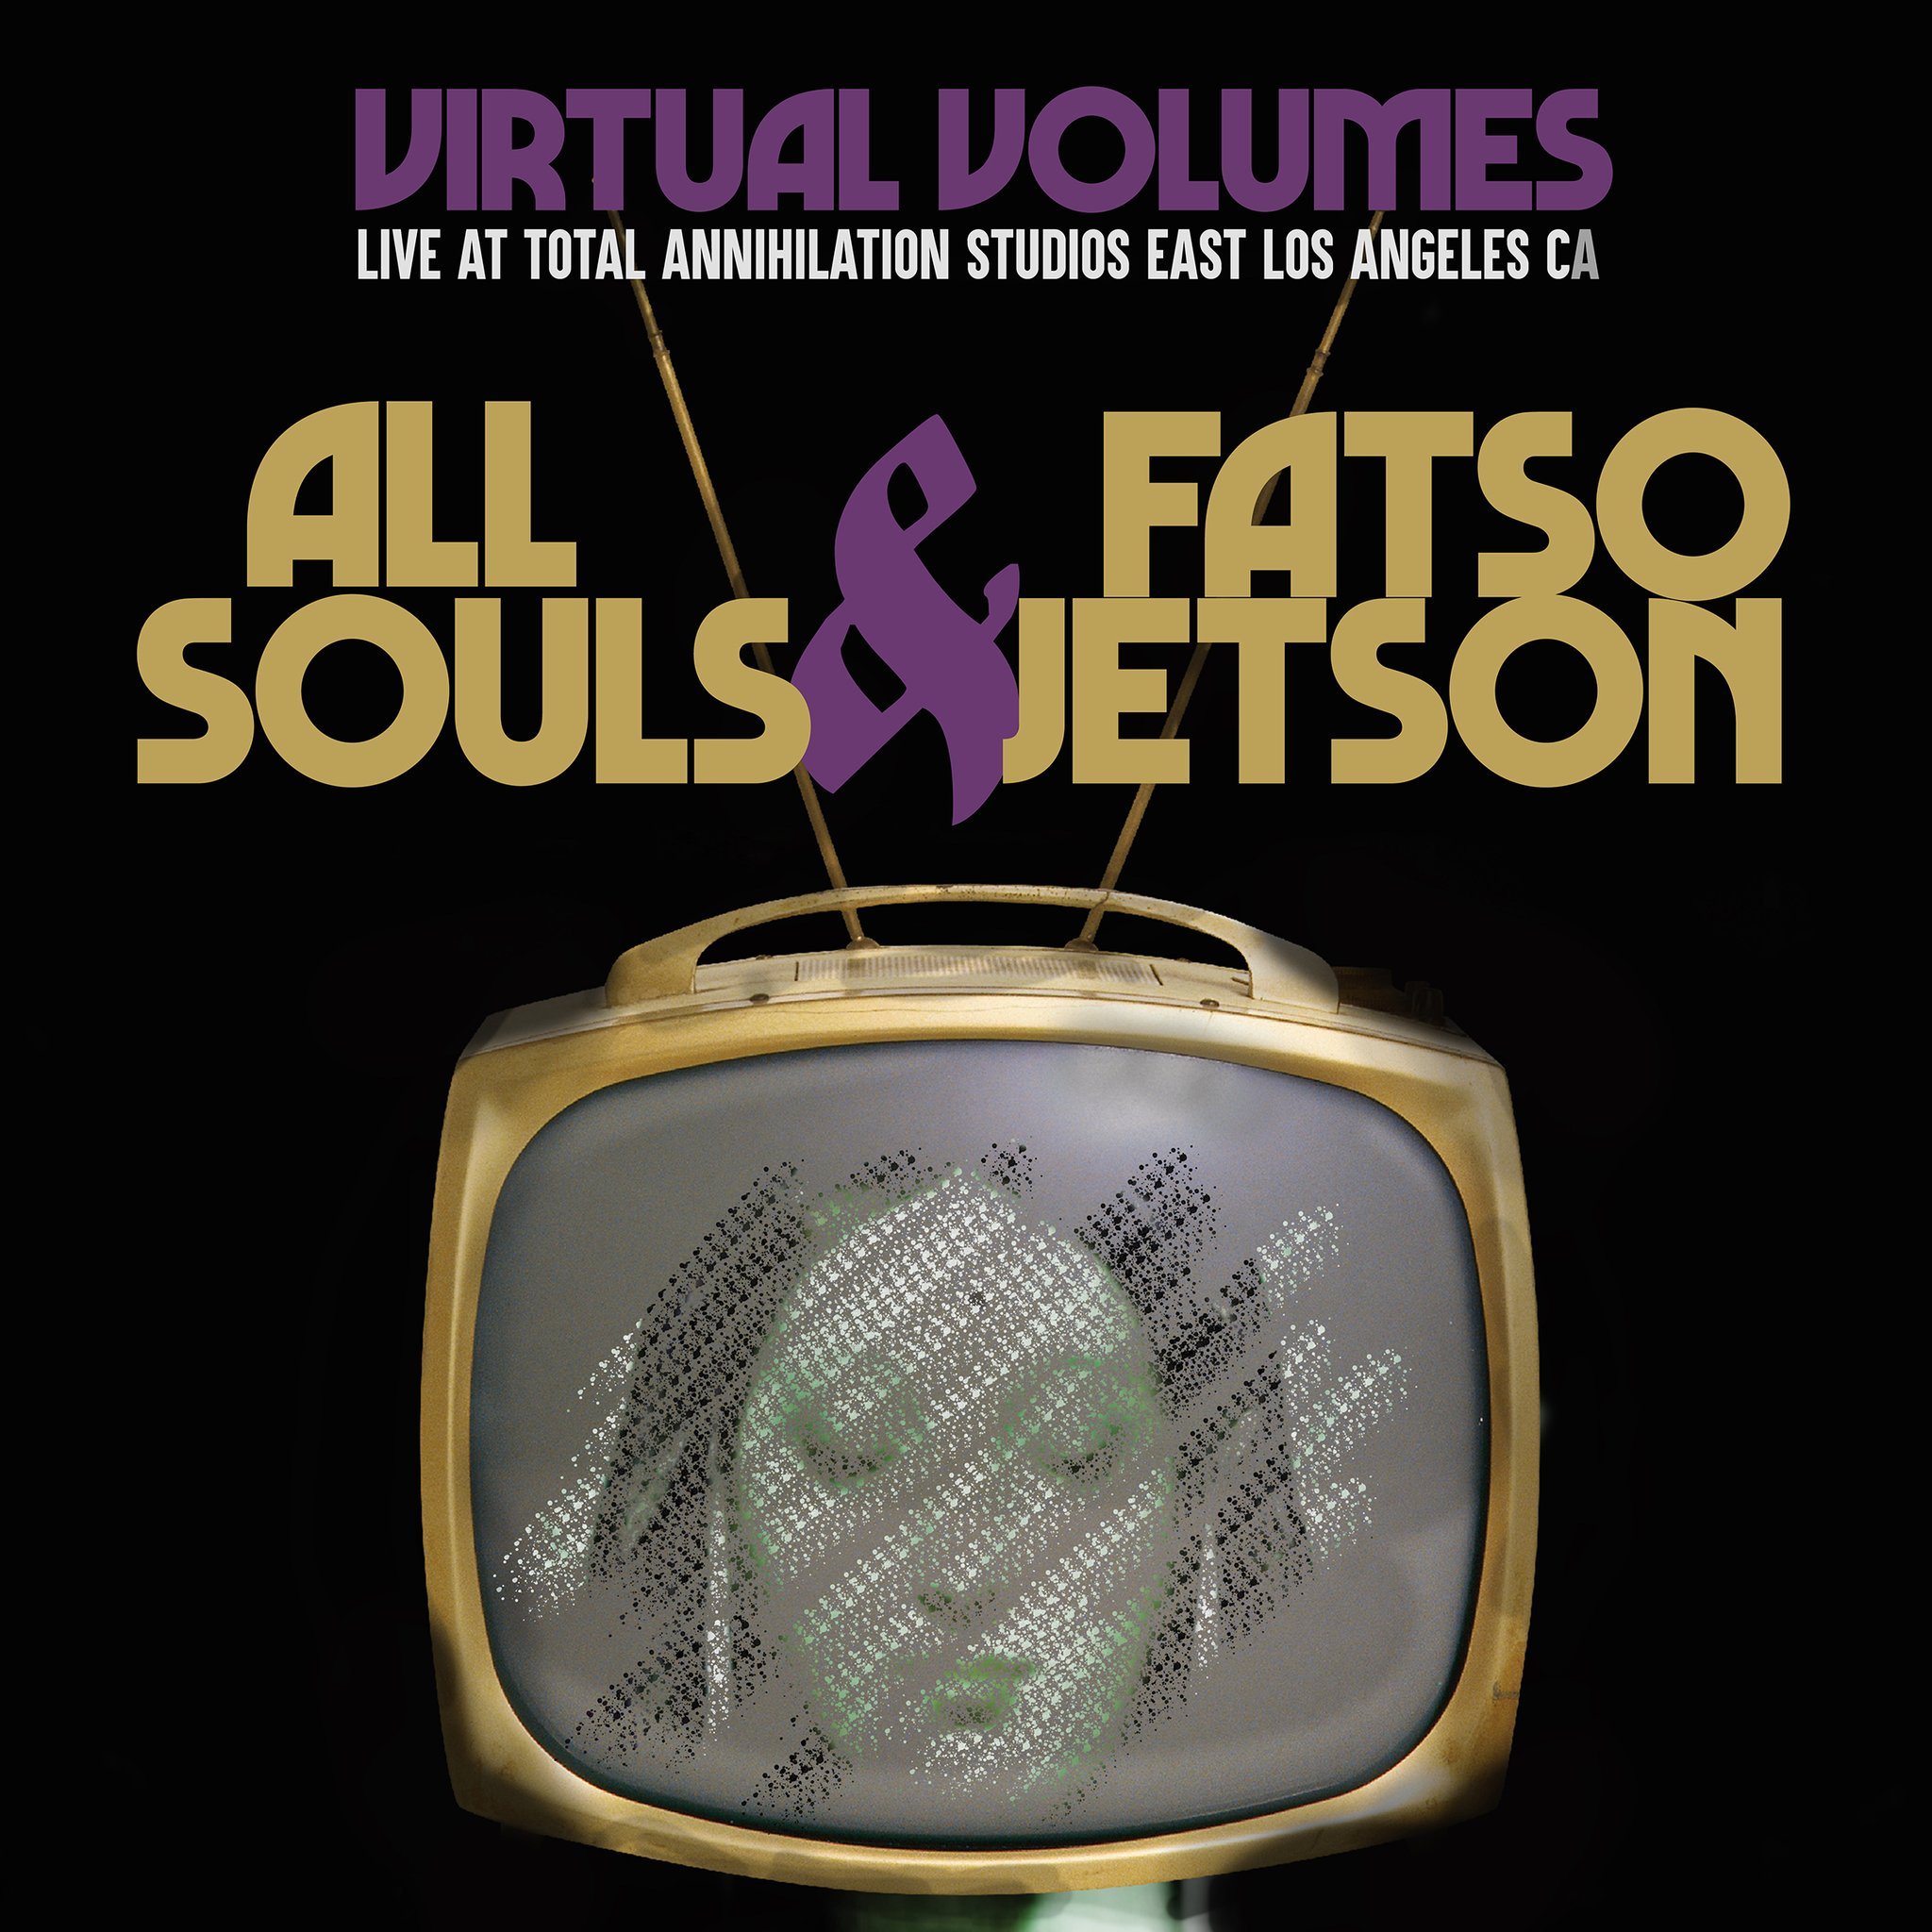 fatso jetson all souls virtual volumes